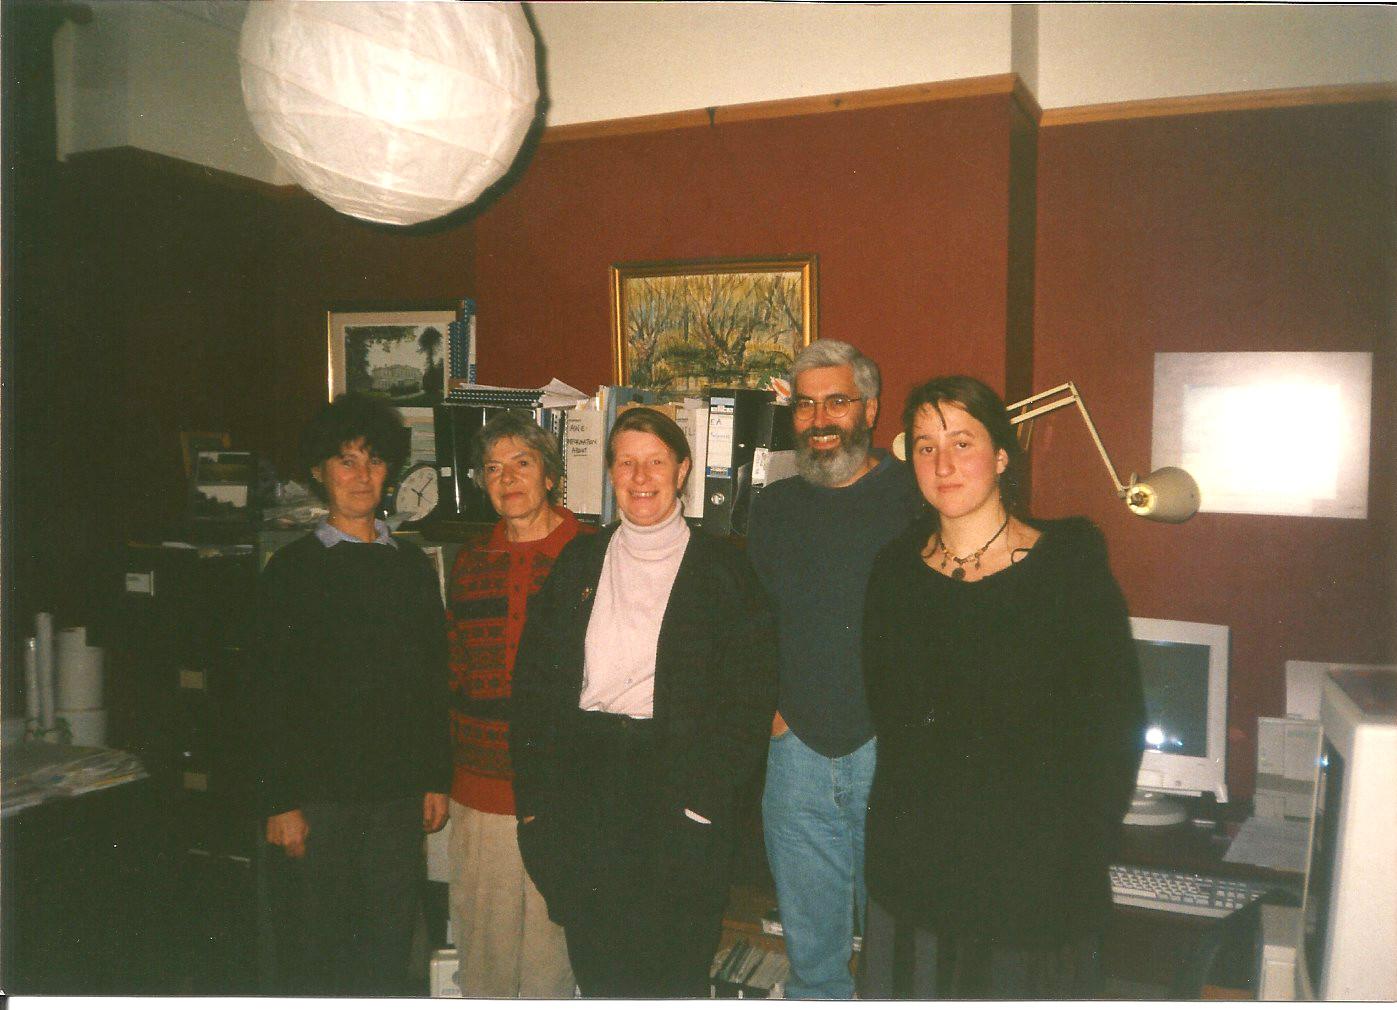 NIS Ofice Southampton (L-R) Di McDonald, Evelyn Parker, Rita Leighton, Duncan Barnett and Tania Zeigler